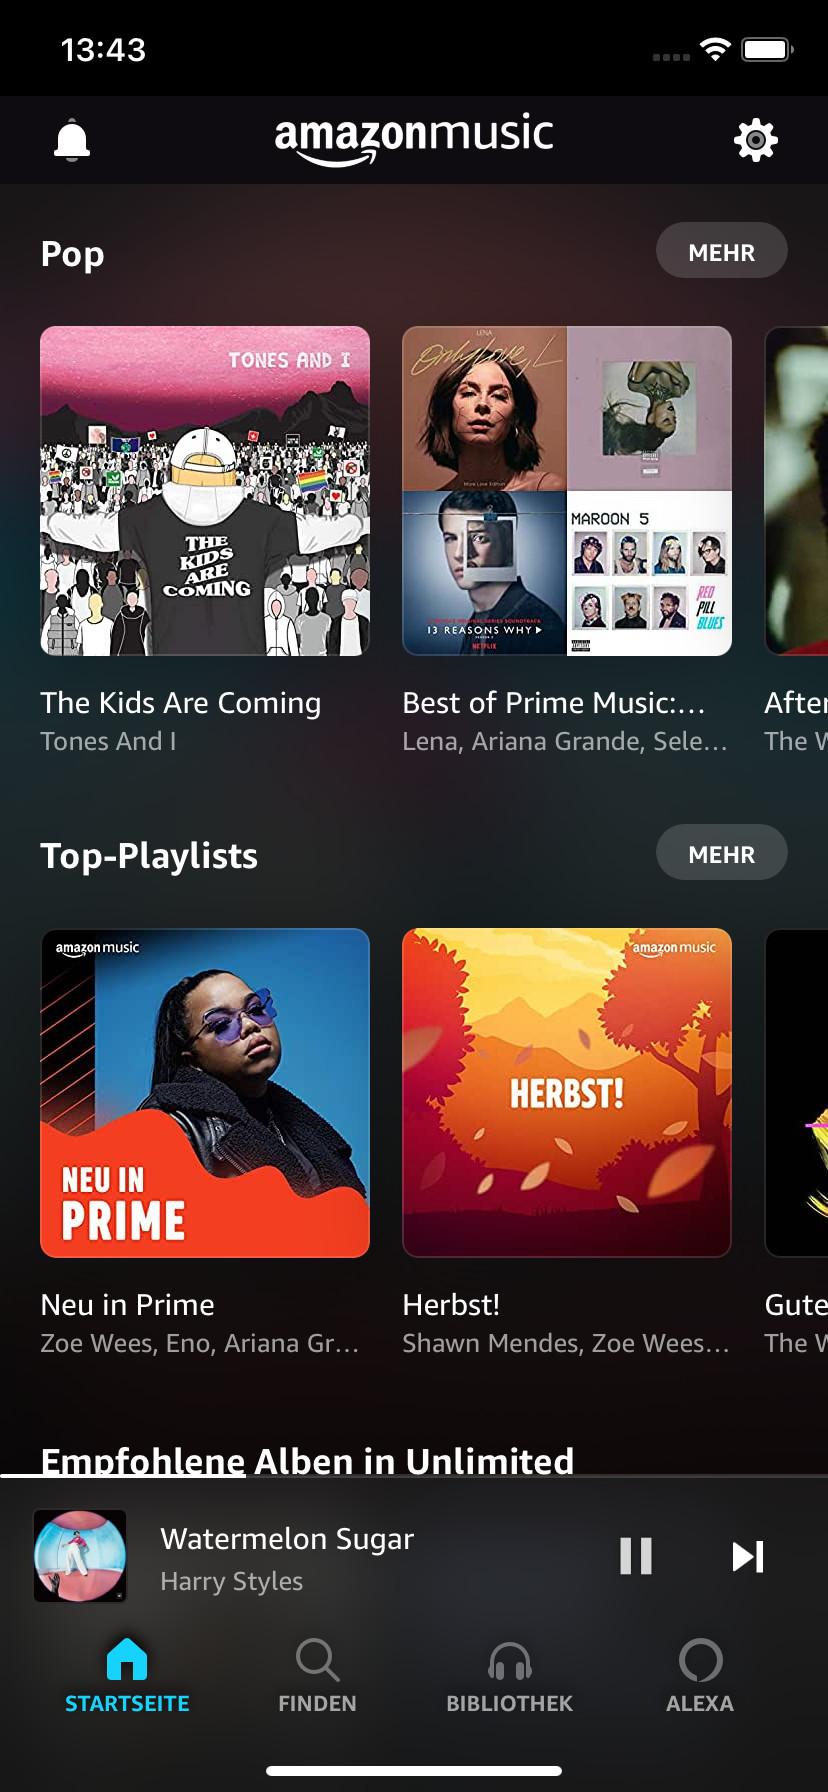 Screenshot 1 - Amazon Music (App für iPhone & iPad)